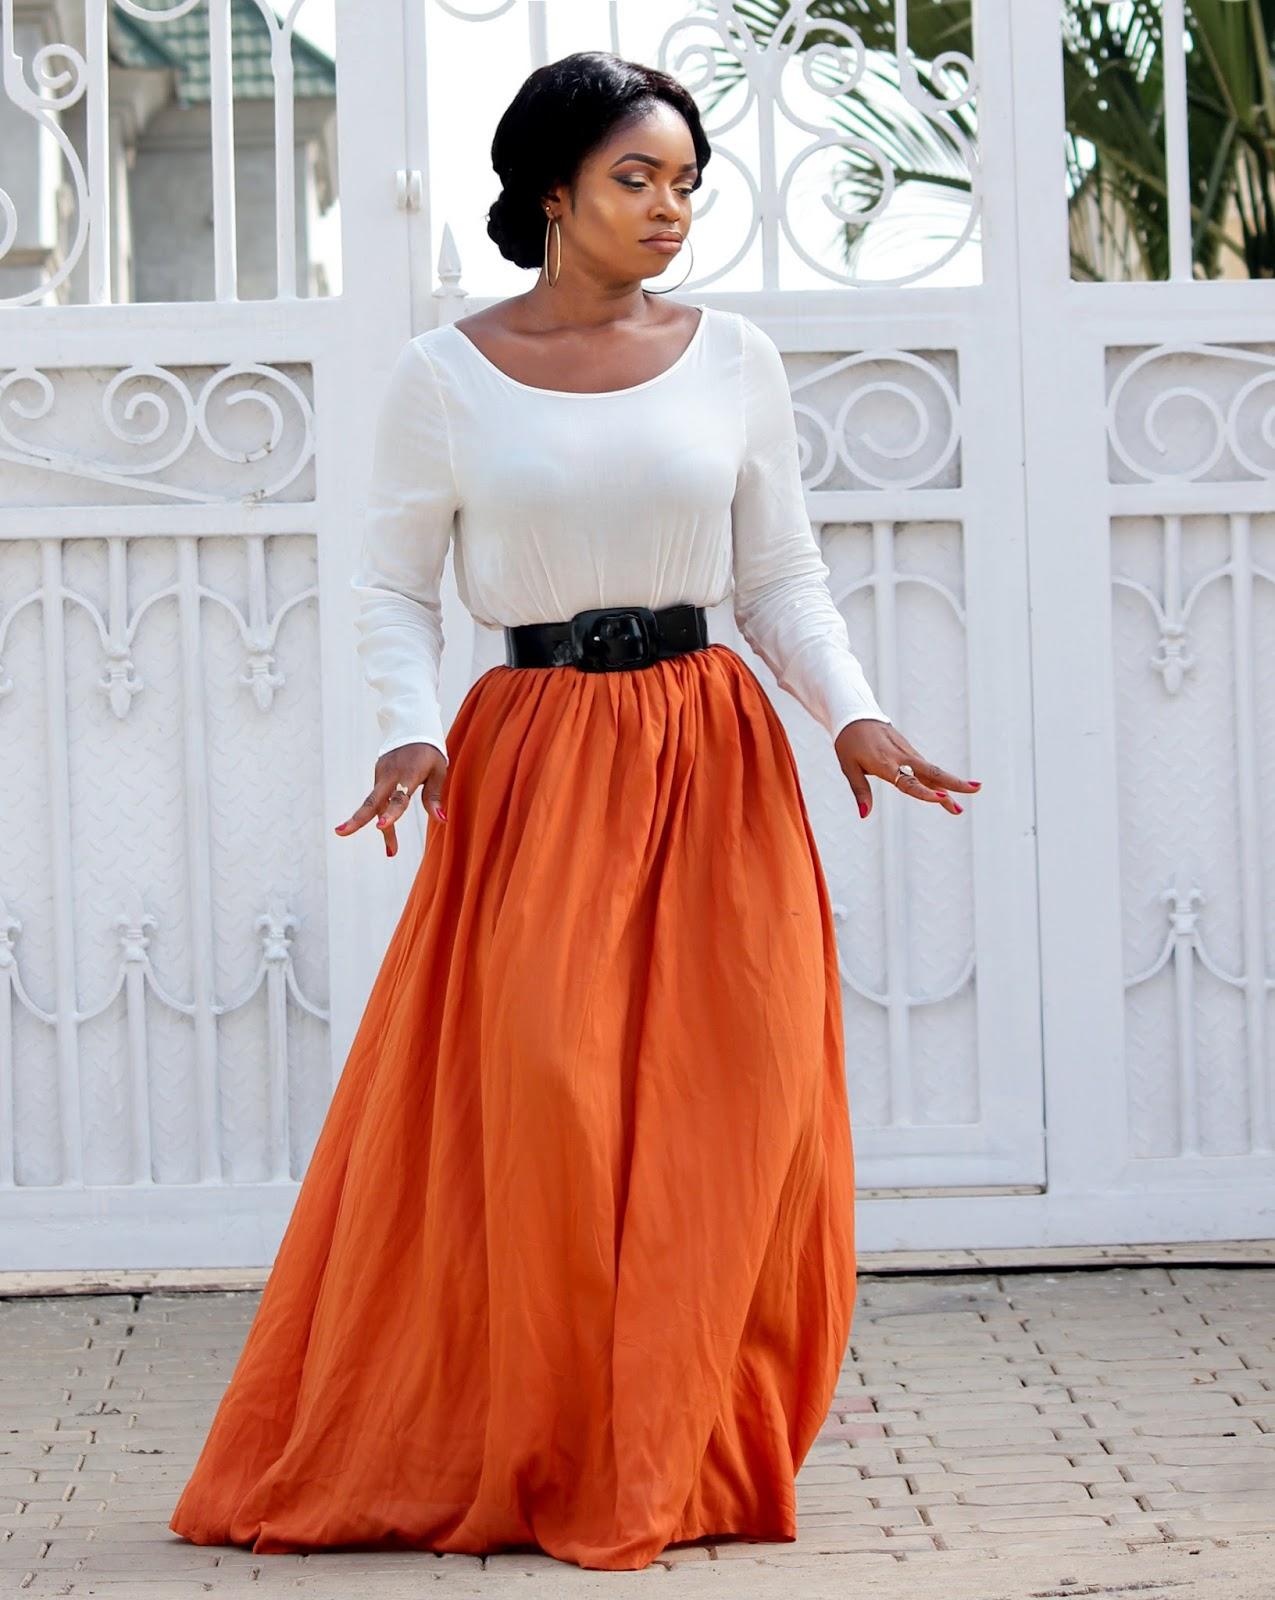 CRISS-CROSS BACK MAXI - Orange Spliced Back Criss-Cross Maxi Dress